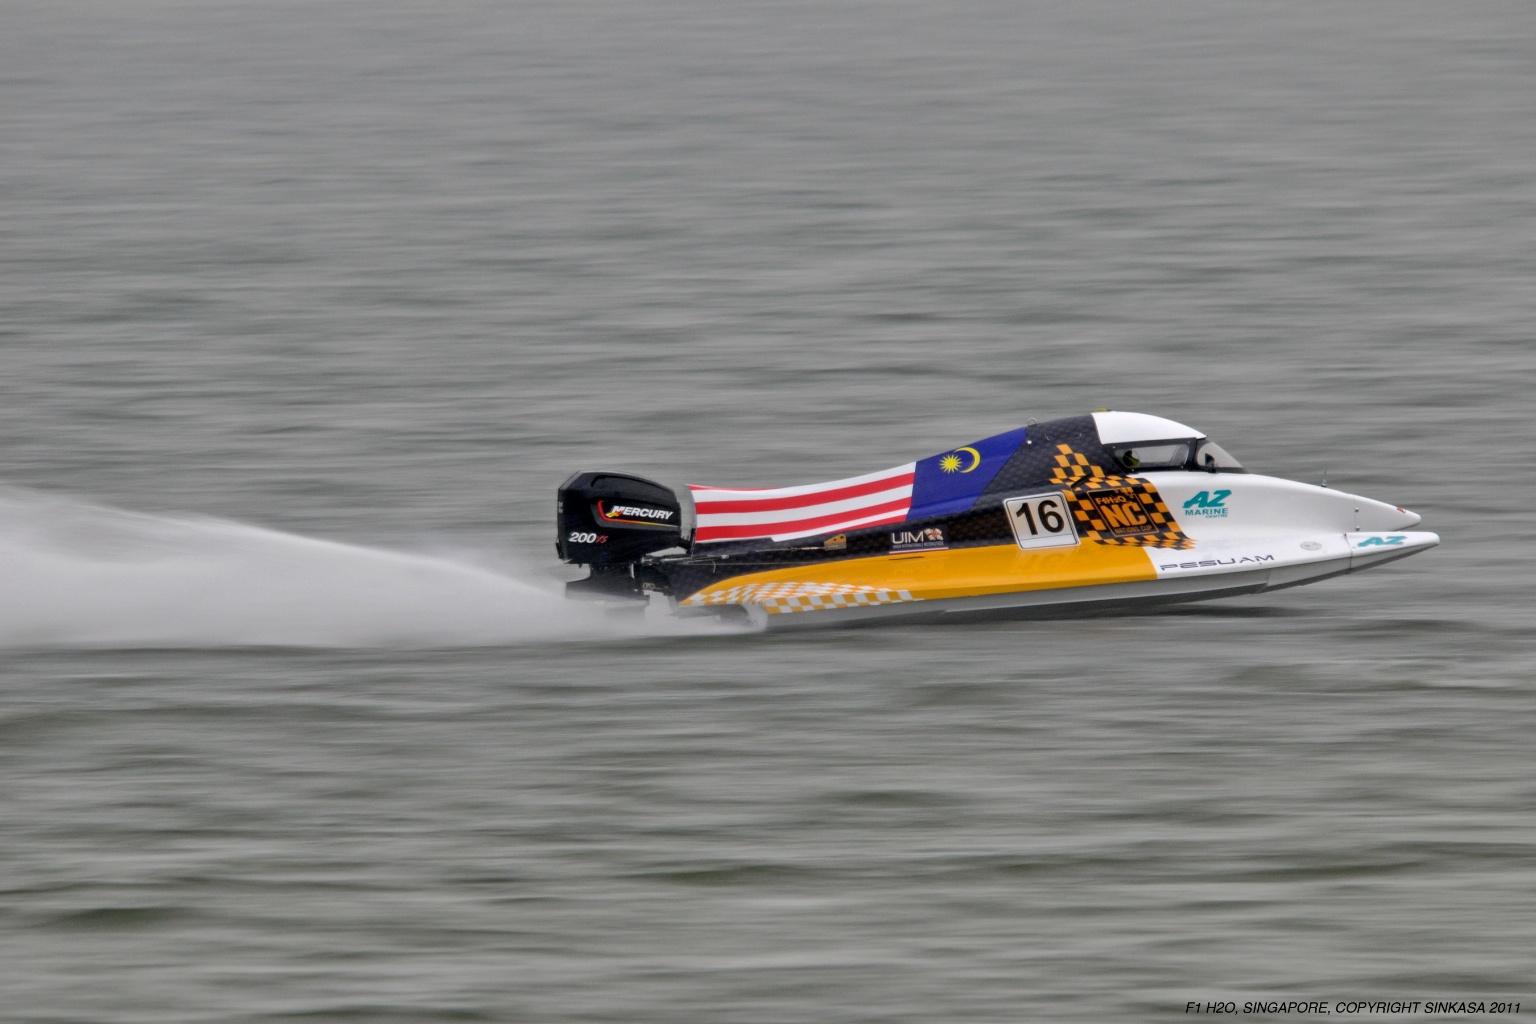 Through The Lens Of Sinkasa F1 H2o Powerboat Racing